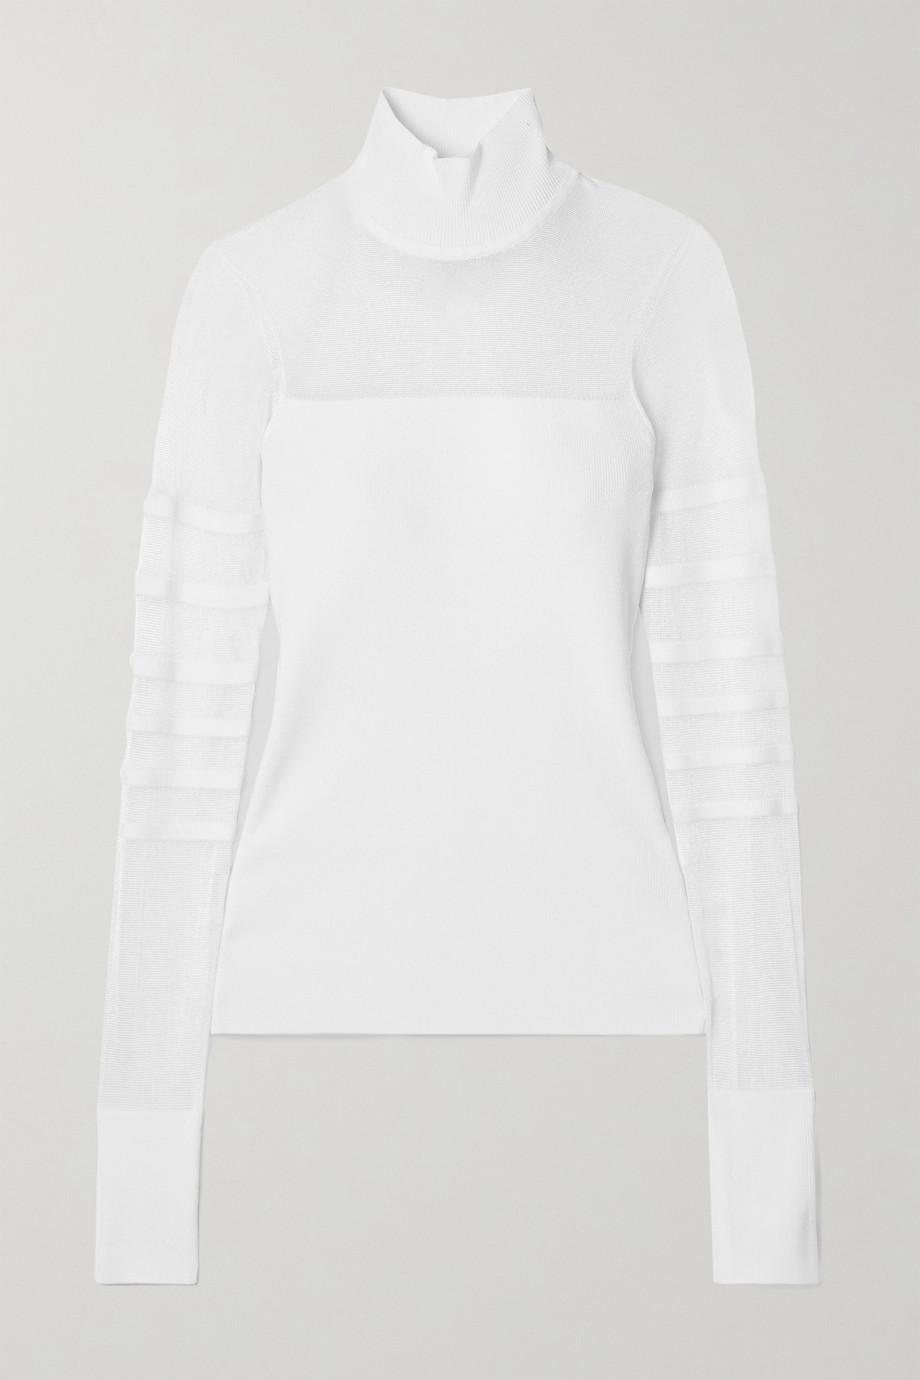 Cushnie Paneled ribbed-knit turtleneck top